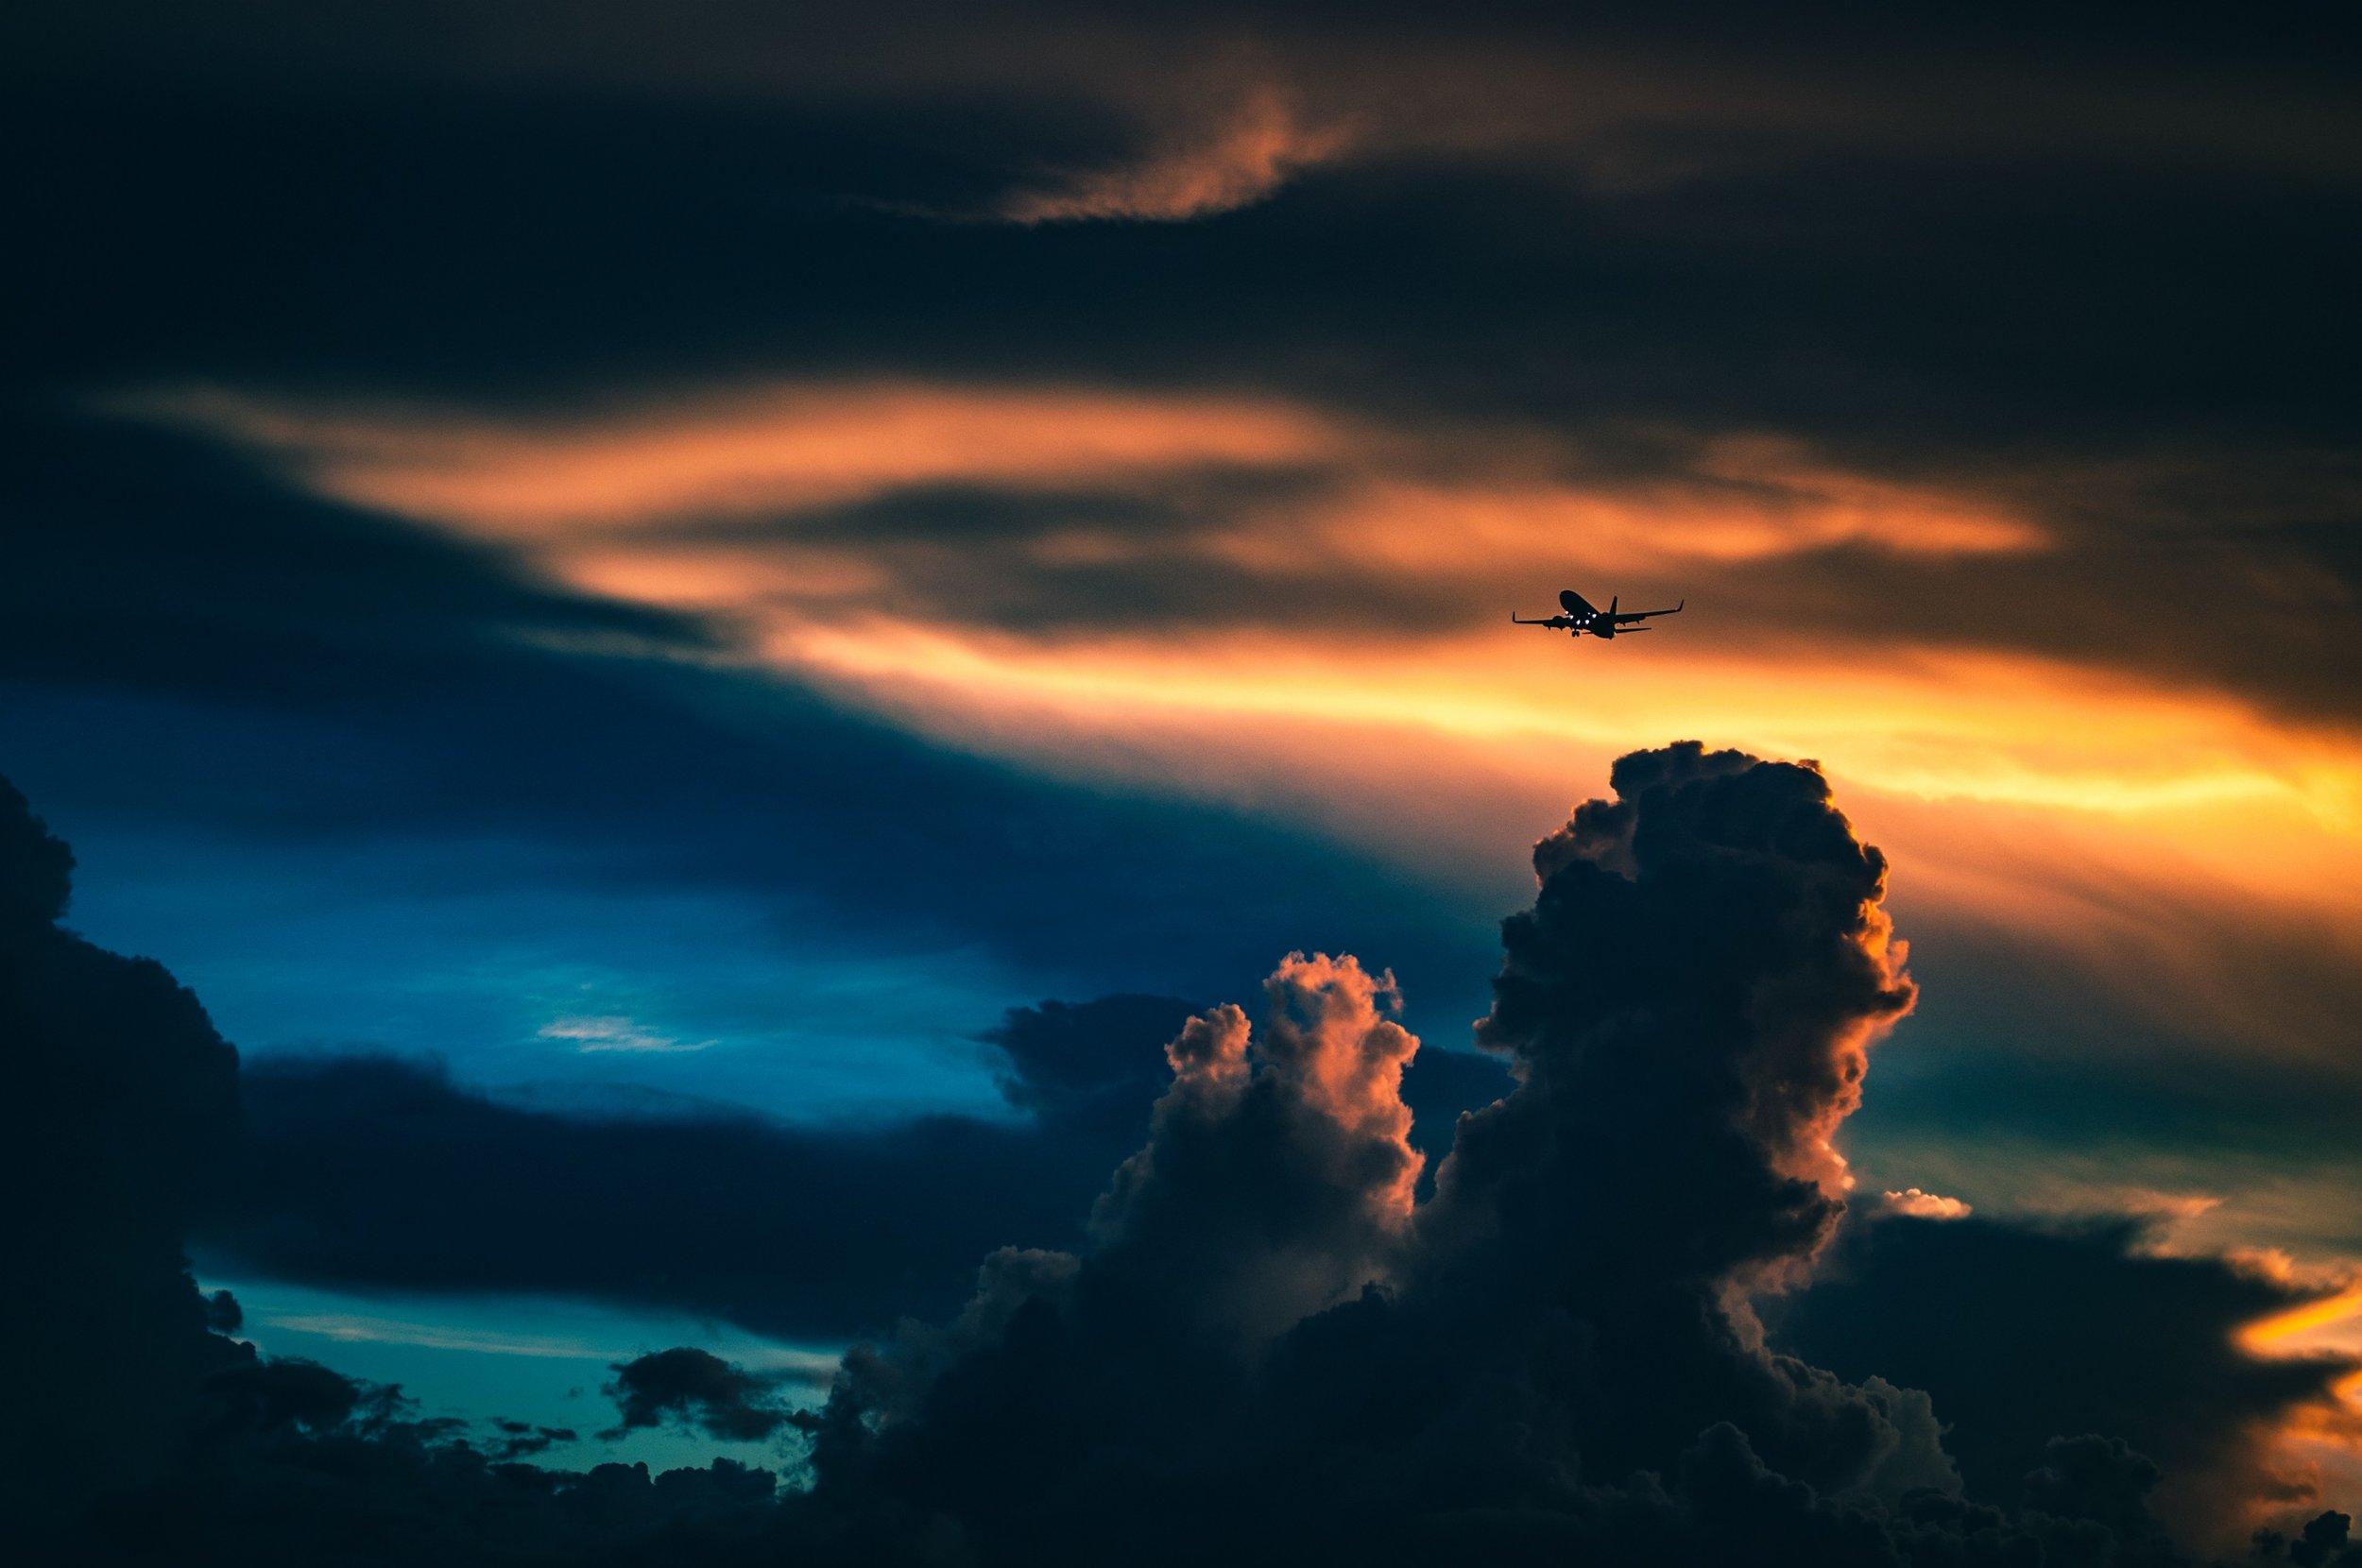 sky-plane-sunset.jpg